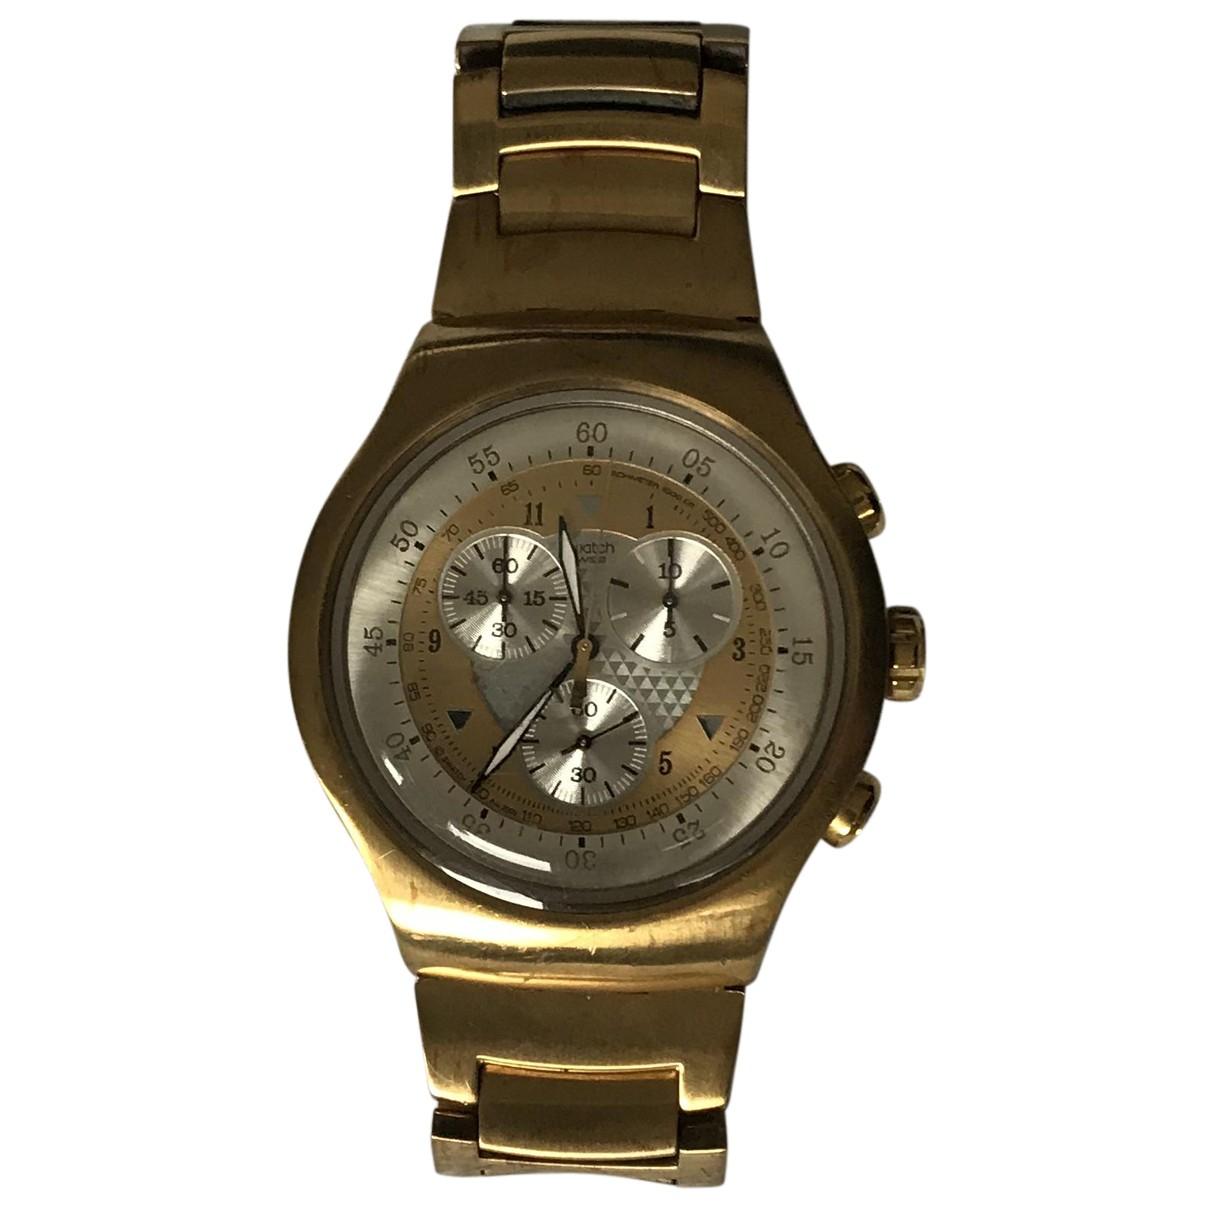 Swatch N Gold Steel watch for Men N